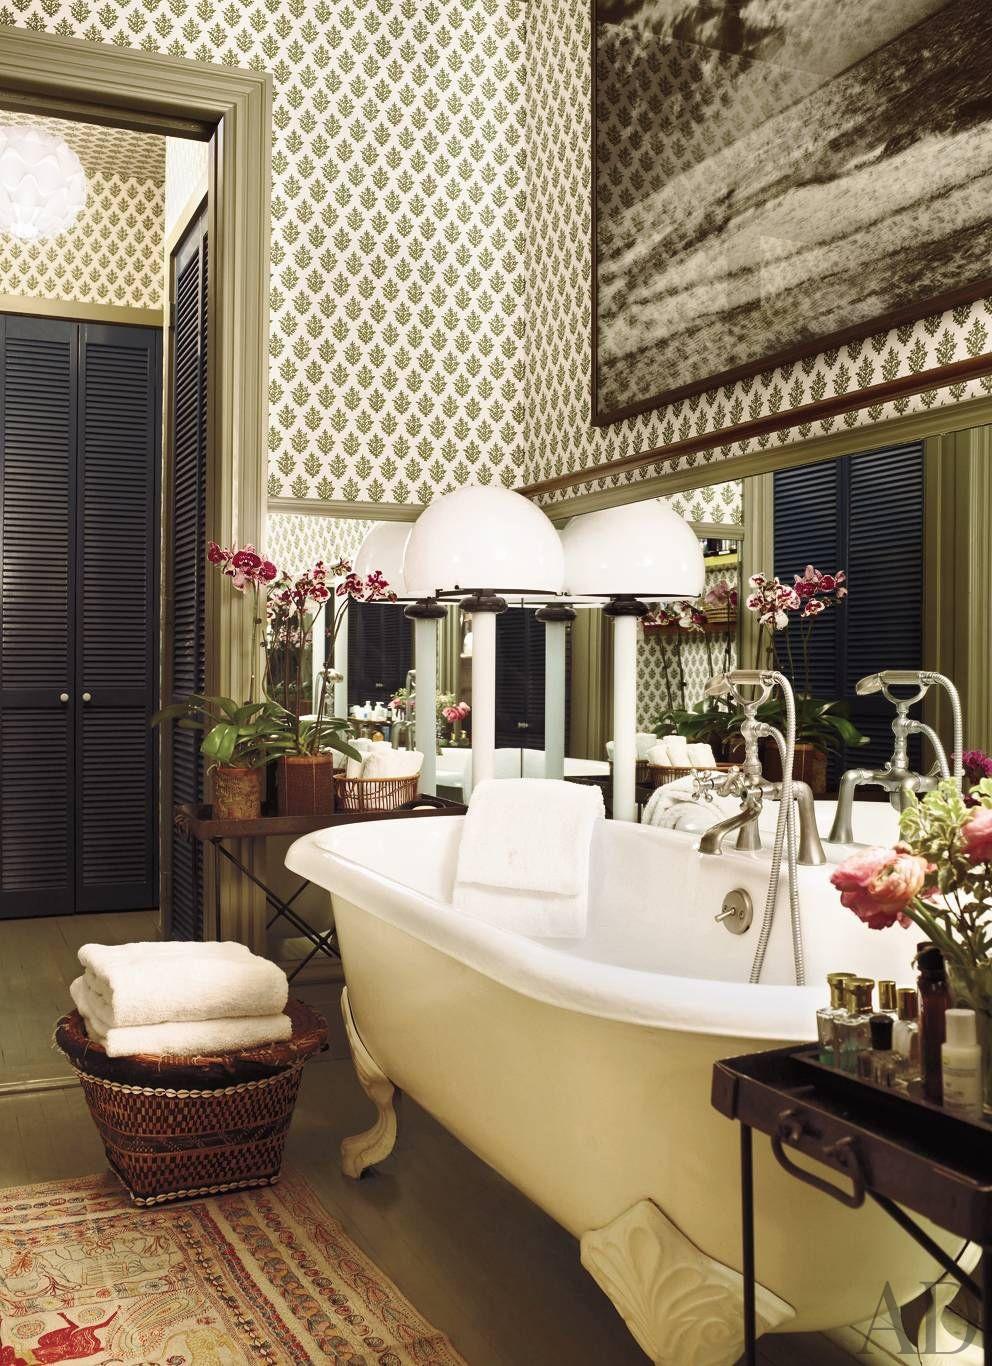 Exotic Bathroom by Muriel Brandolini in New York City